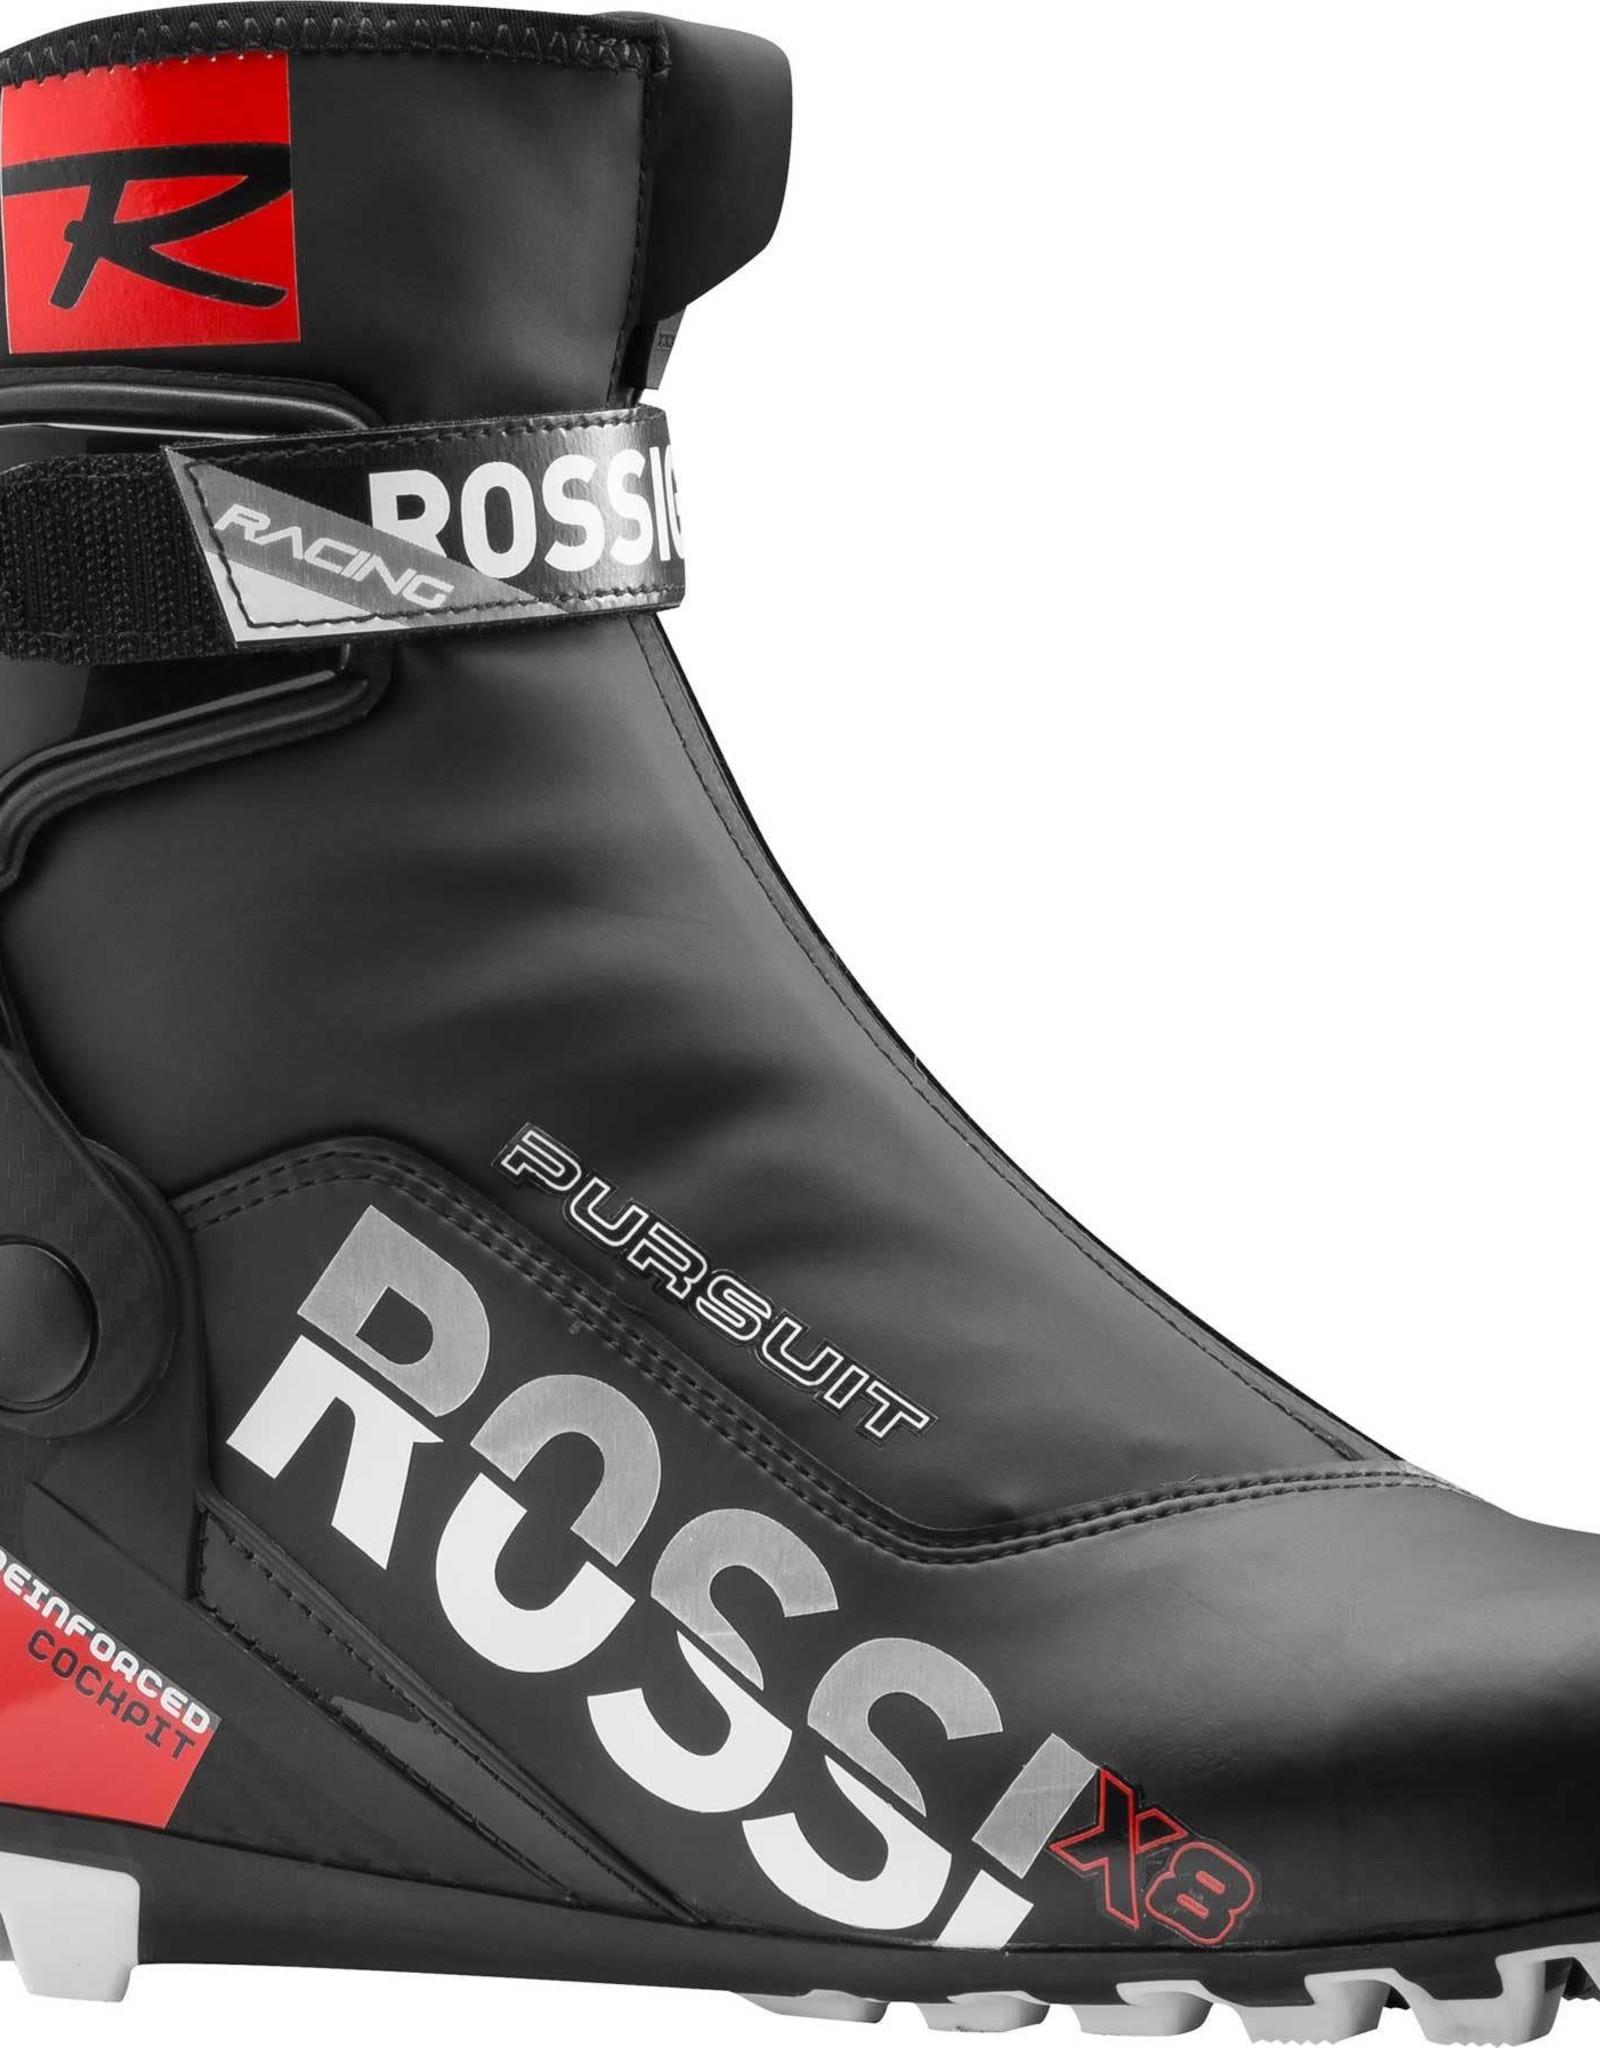 Rossignol Rossignol 2021  X8 SC Skate/Classic Combi Boots - RII1270